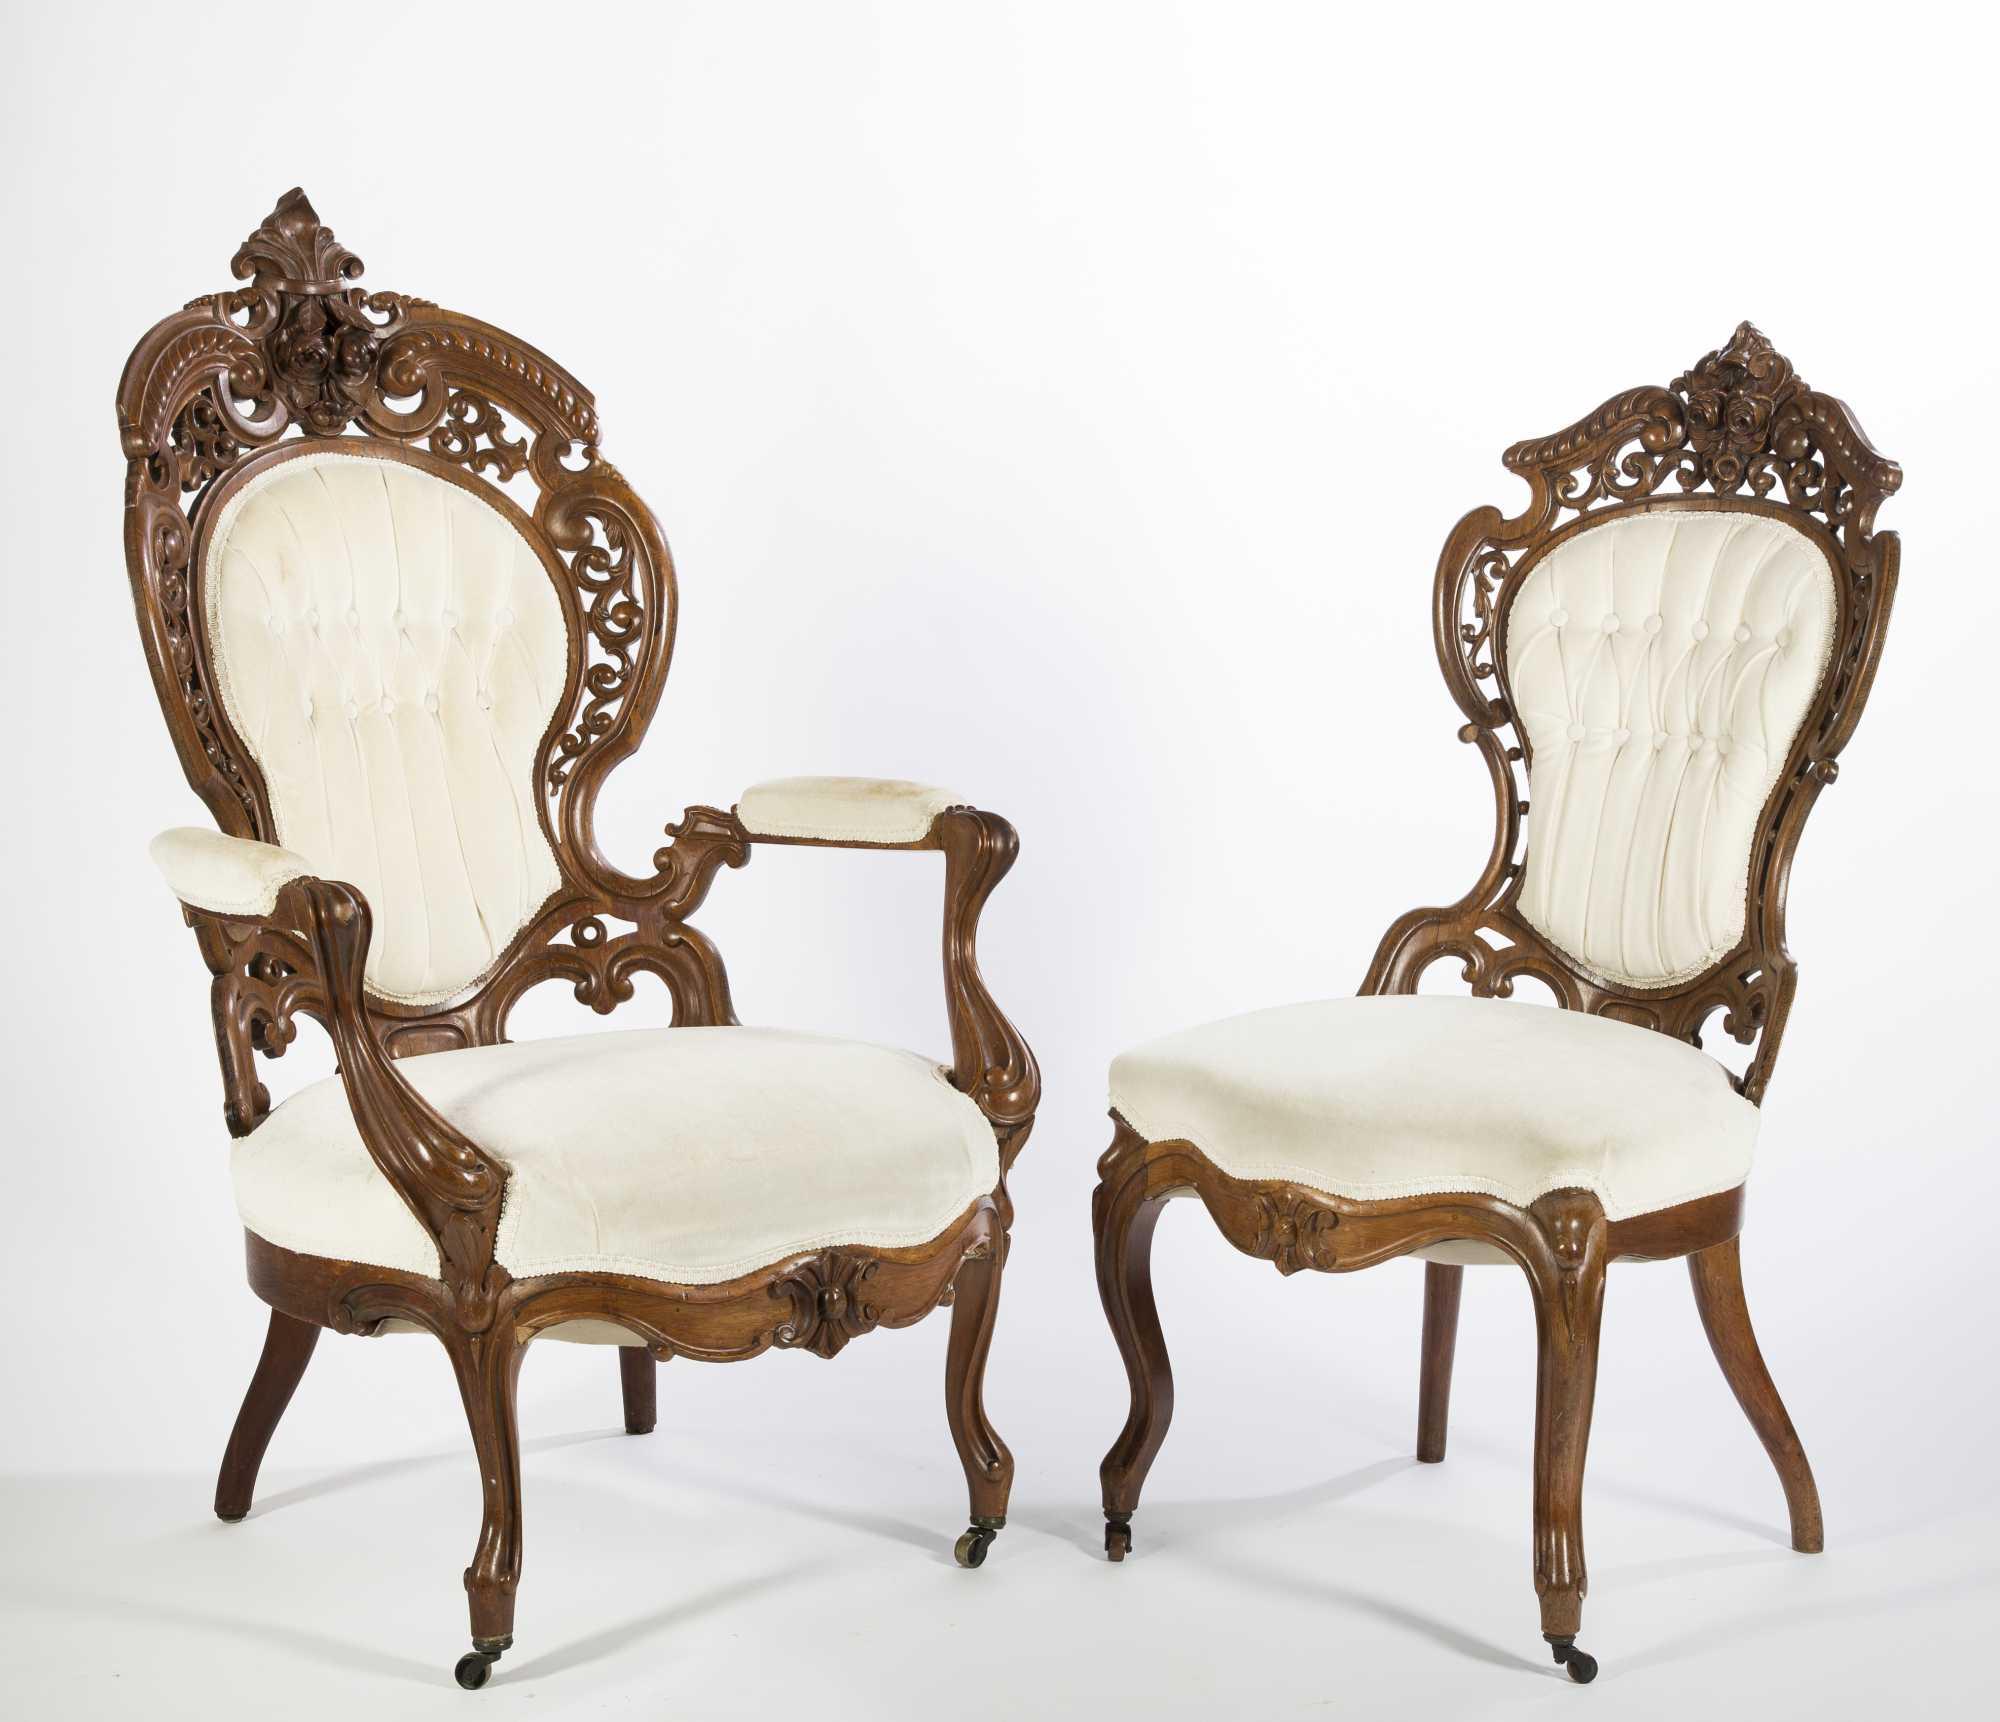 Beautiful Victorian Furniture Chair Contemporary Moder  : a35lot741 max from zeecutt.us size 2000 x 1722 jpeg 160kB